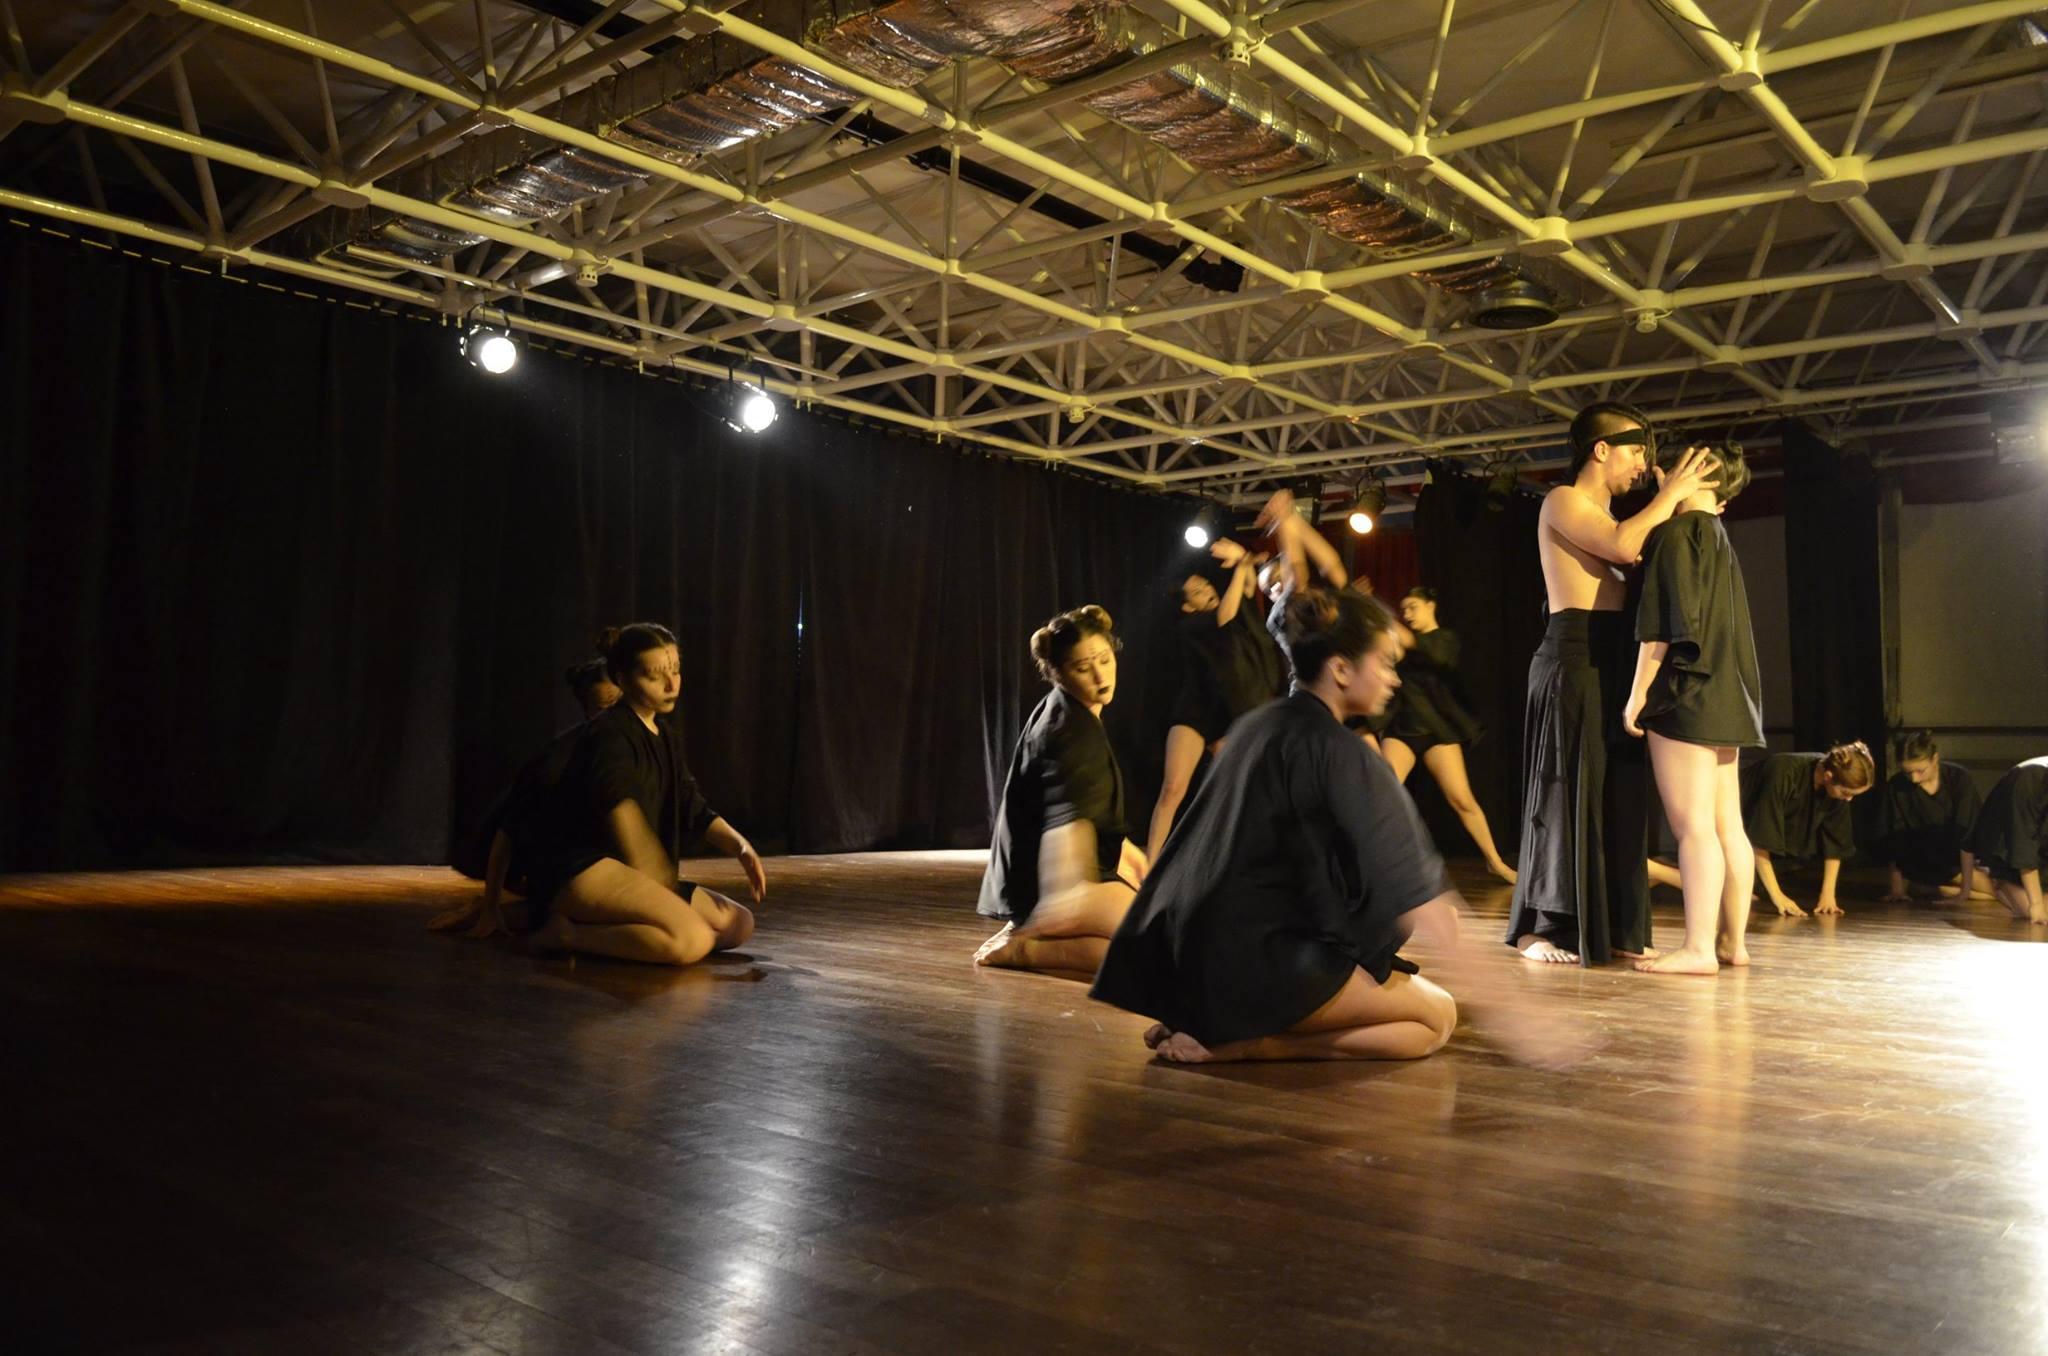 Escuela de Danza Jorge Donn